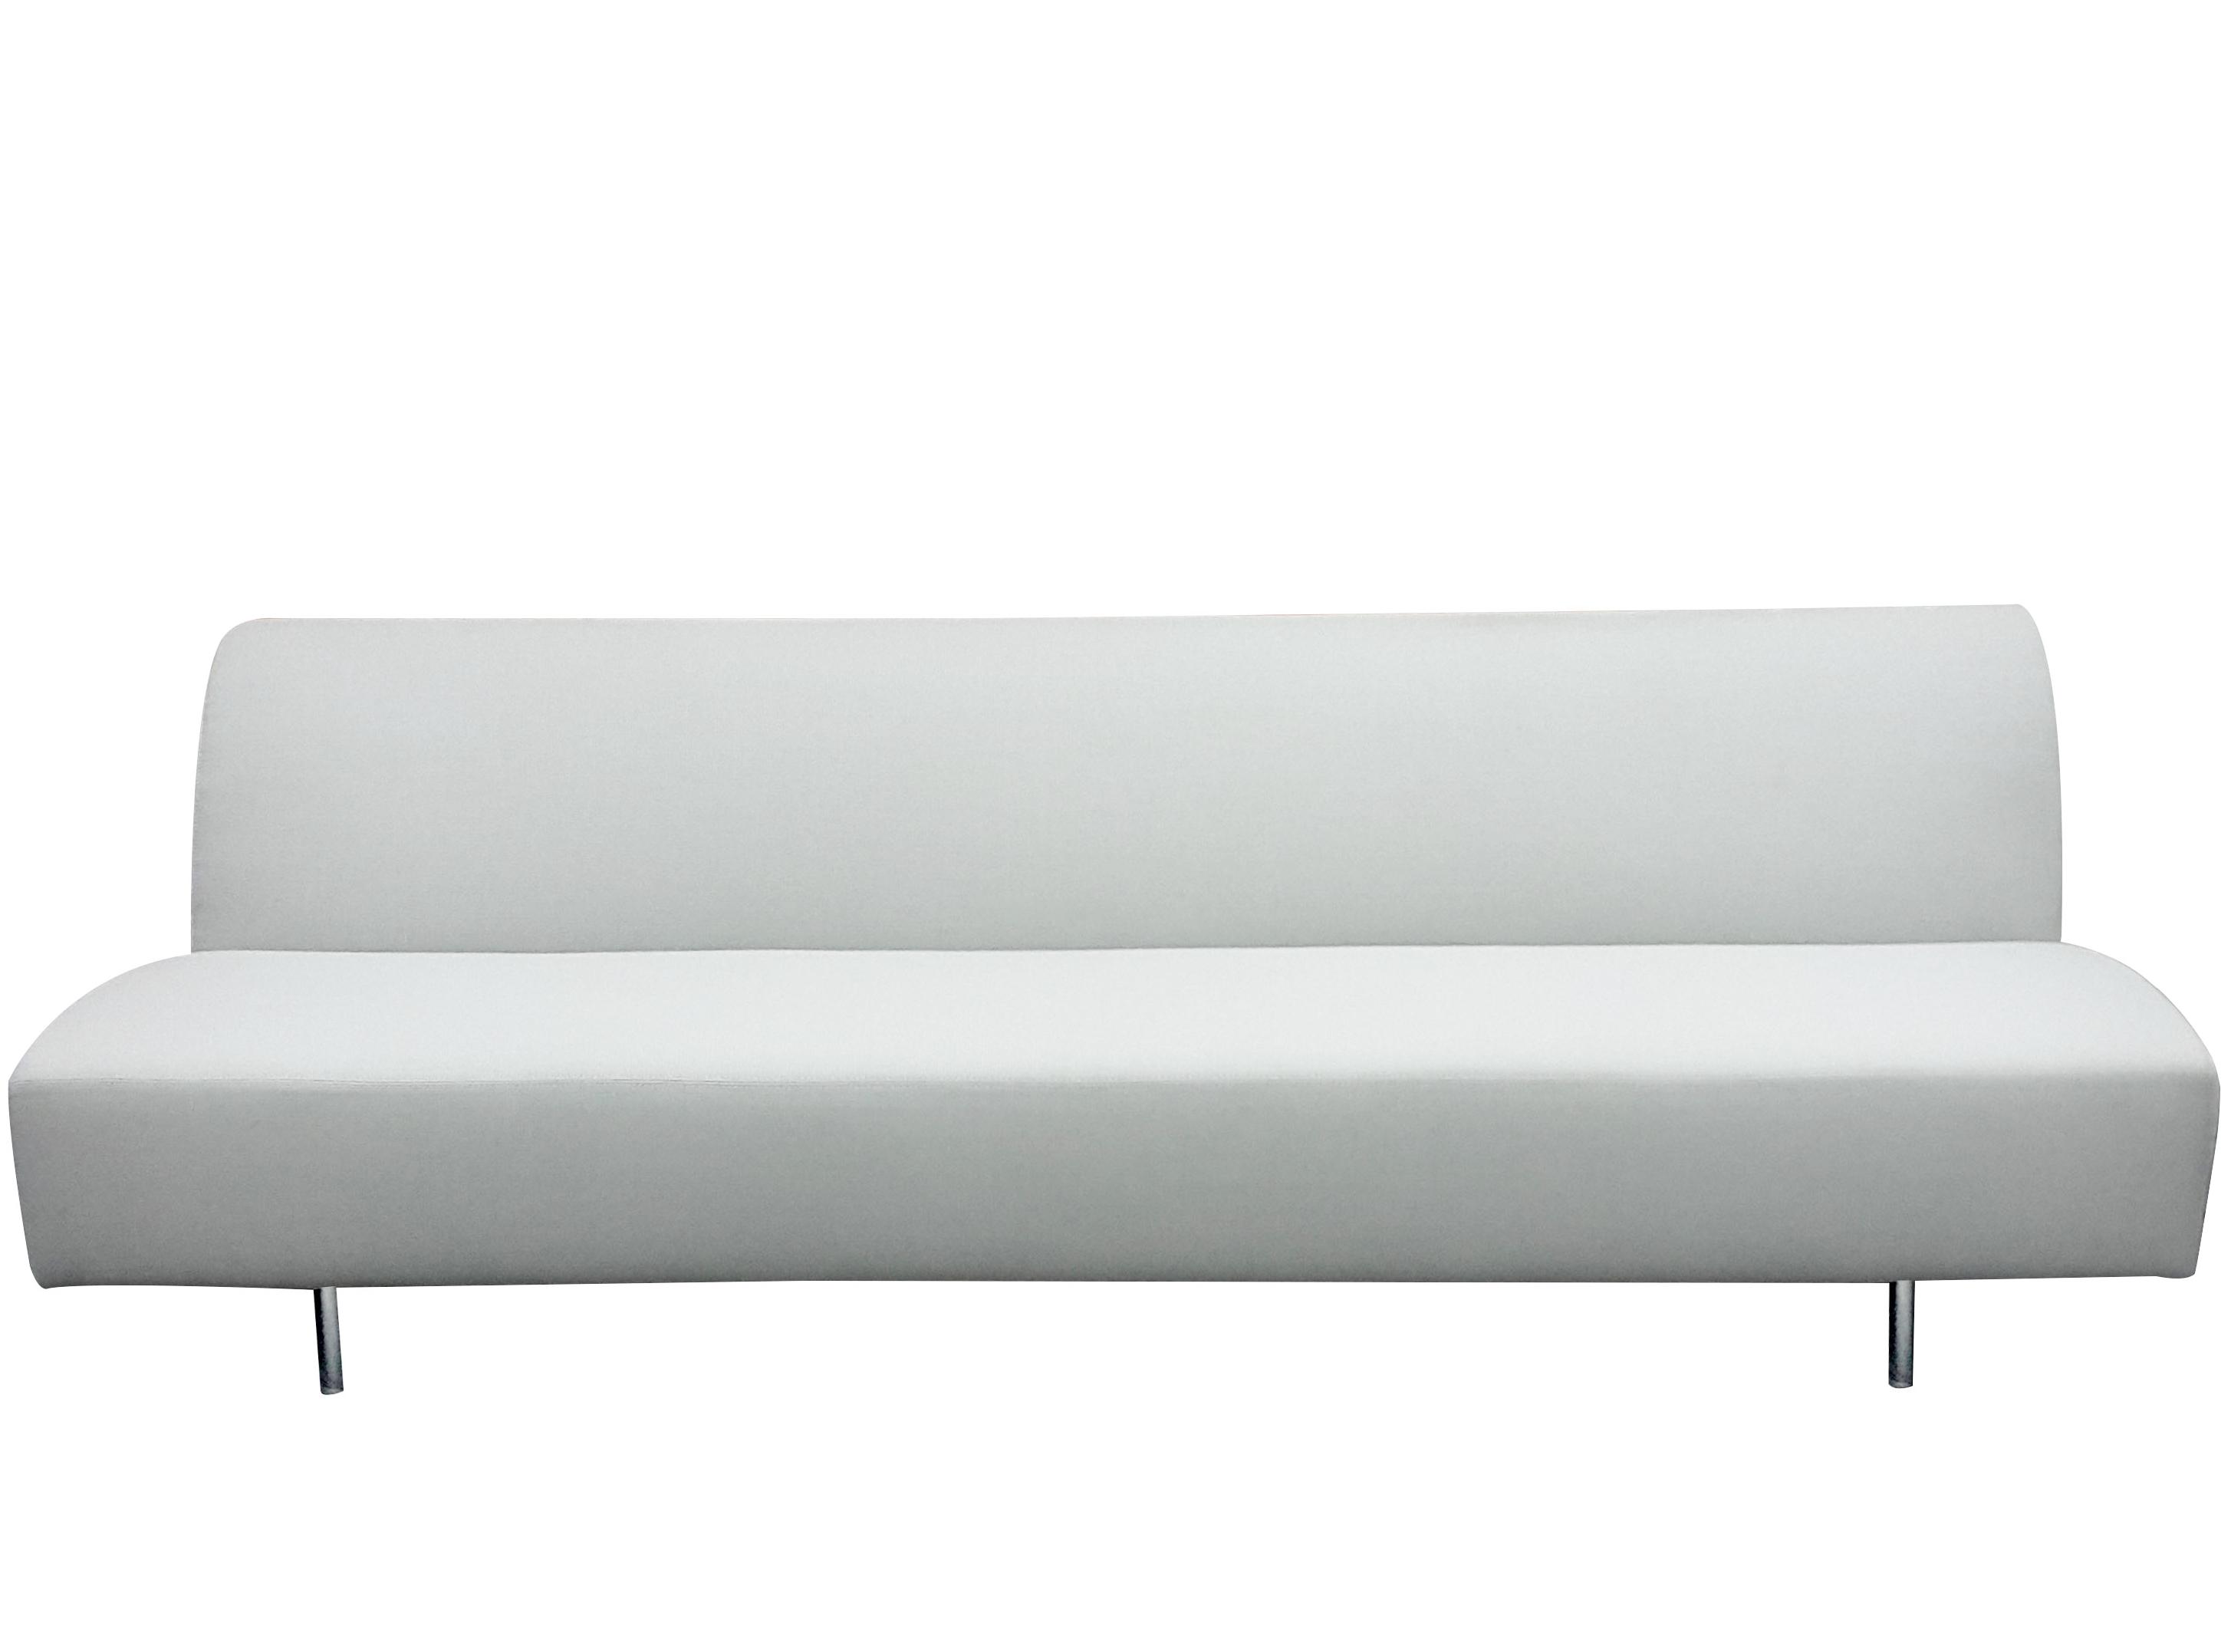 Loop Center 3S sofa